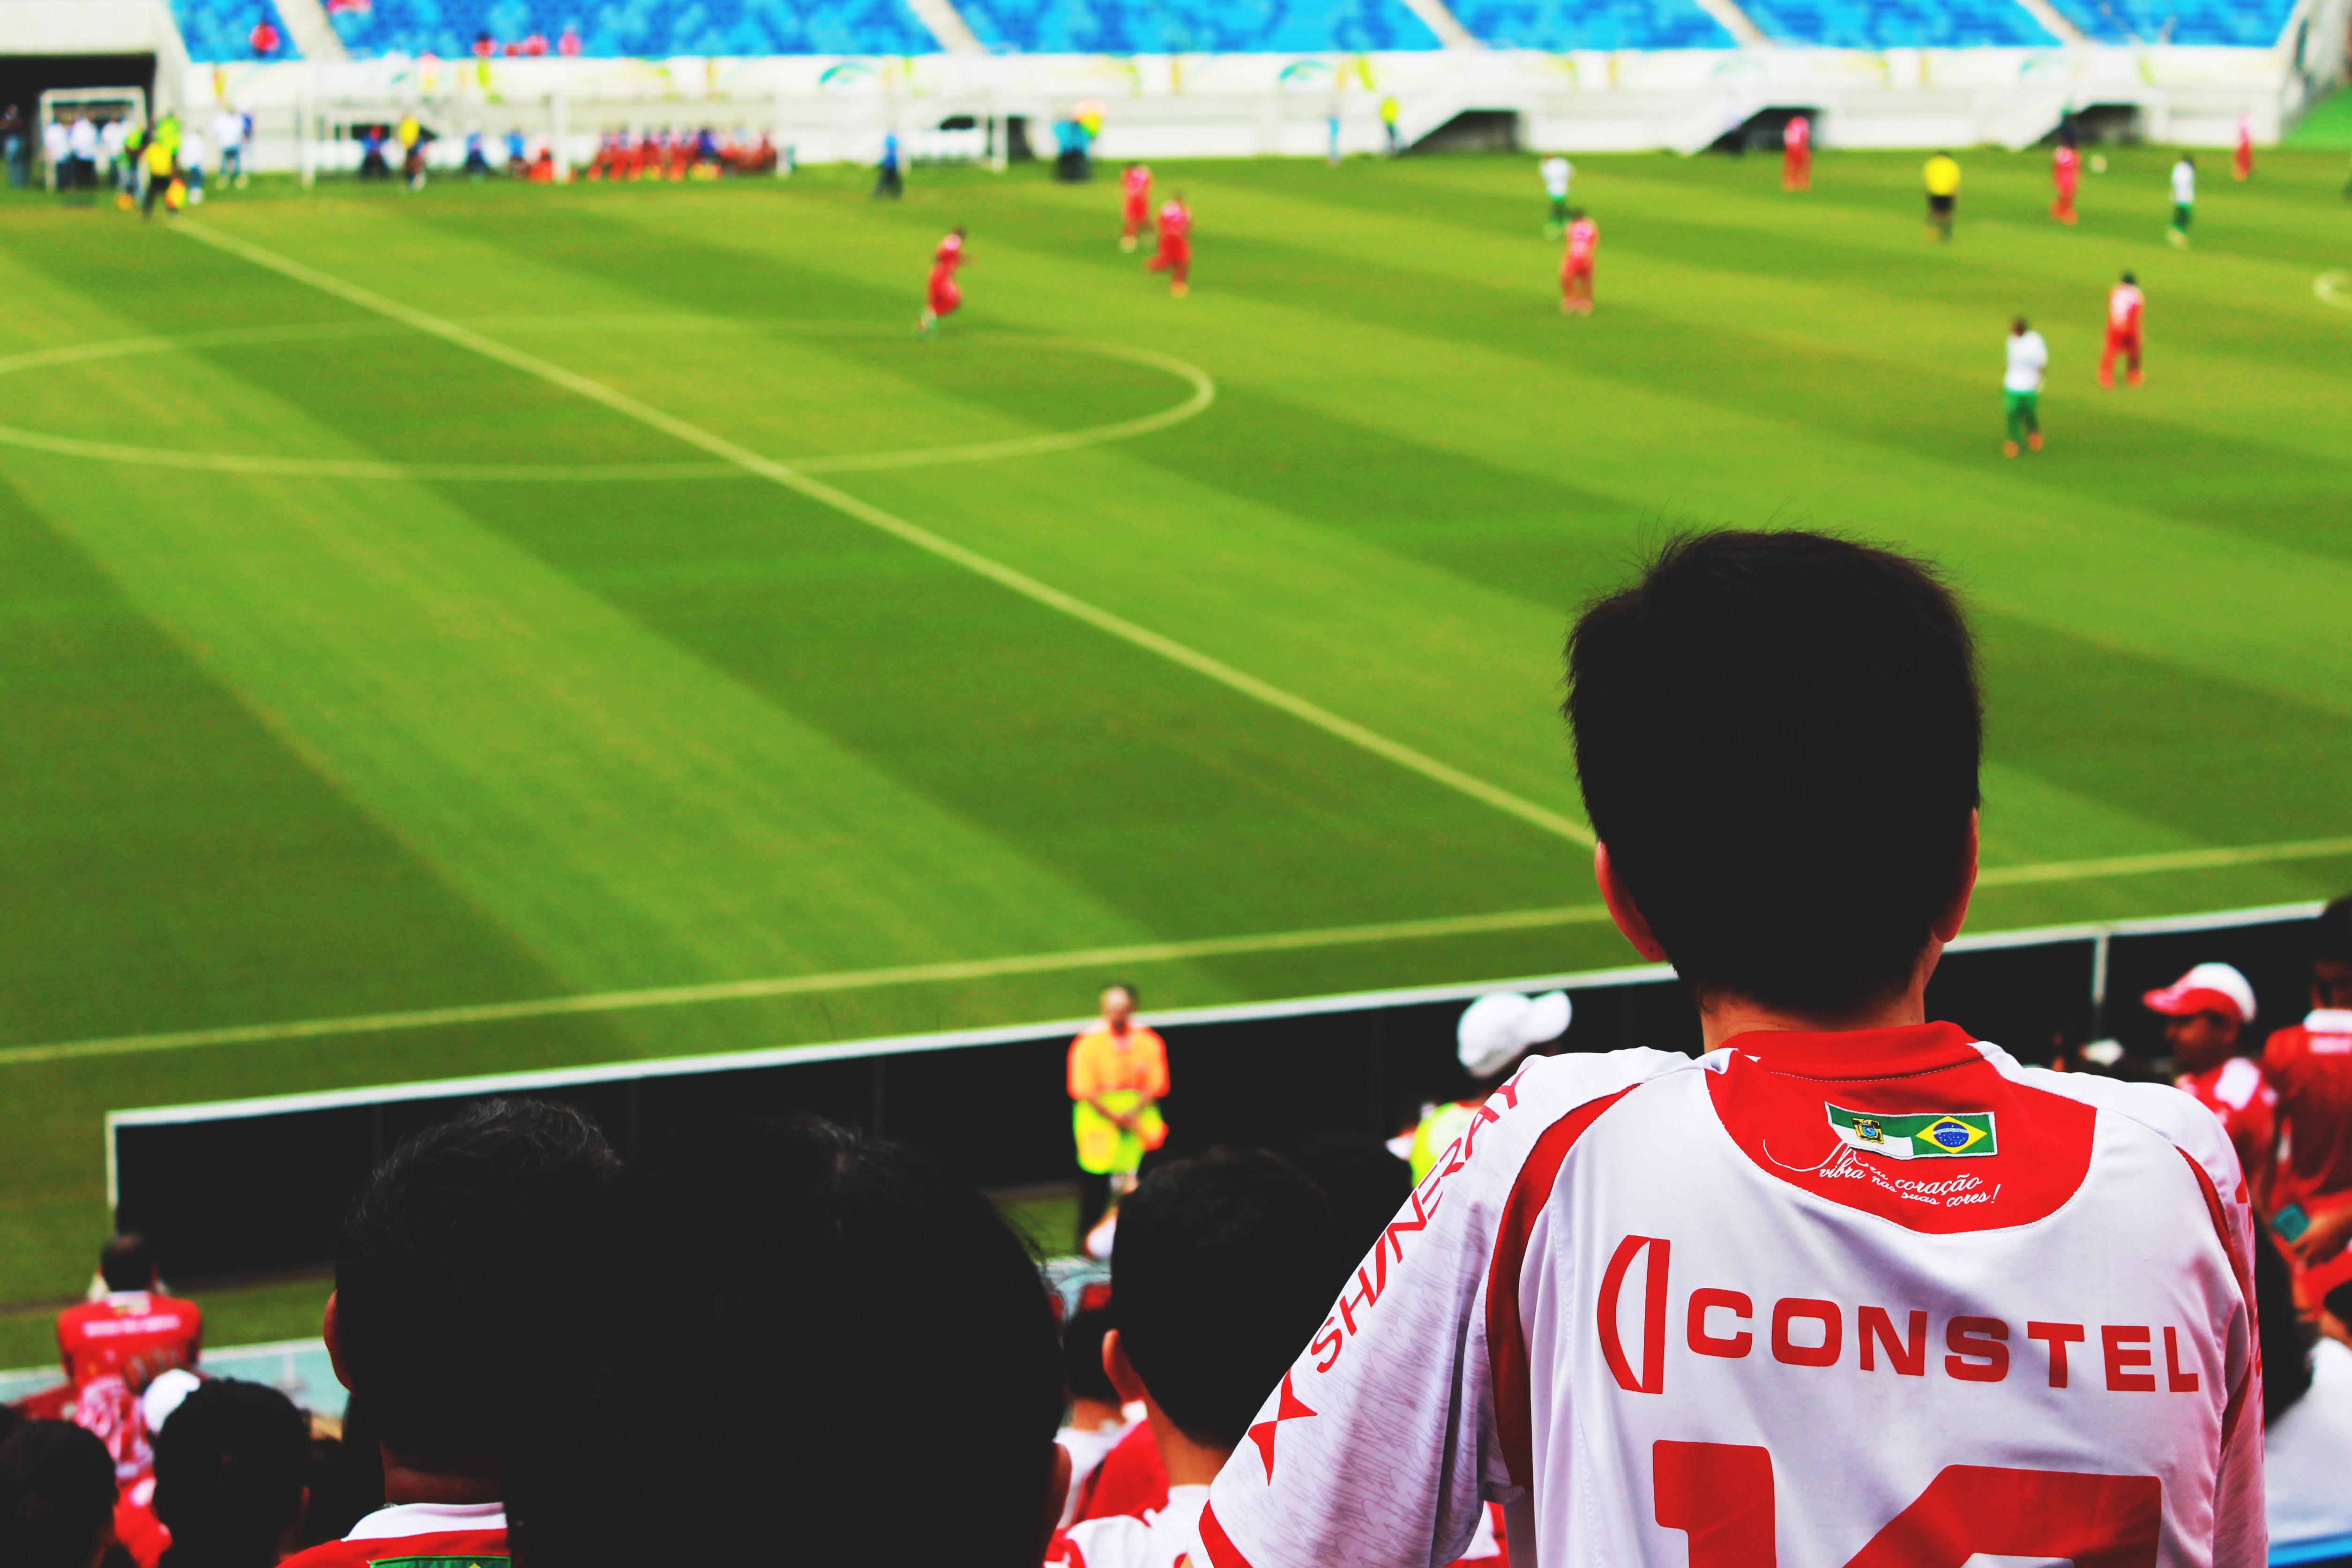 Kostenlose foto : Struktur, Menschen, Sport, Feld, Spiel, Menge ...